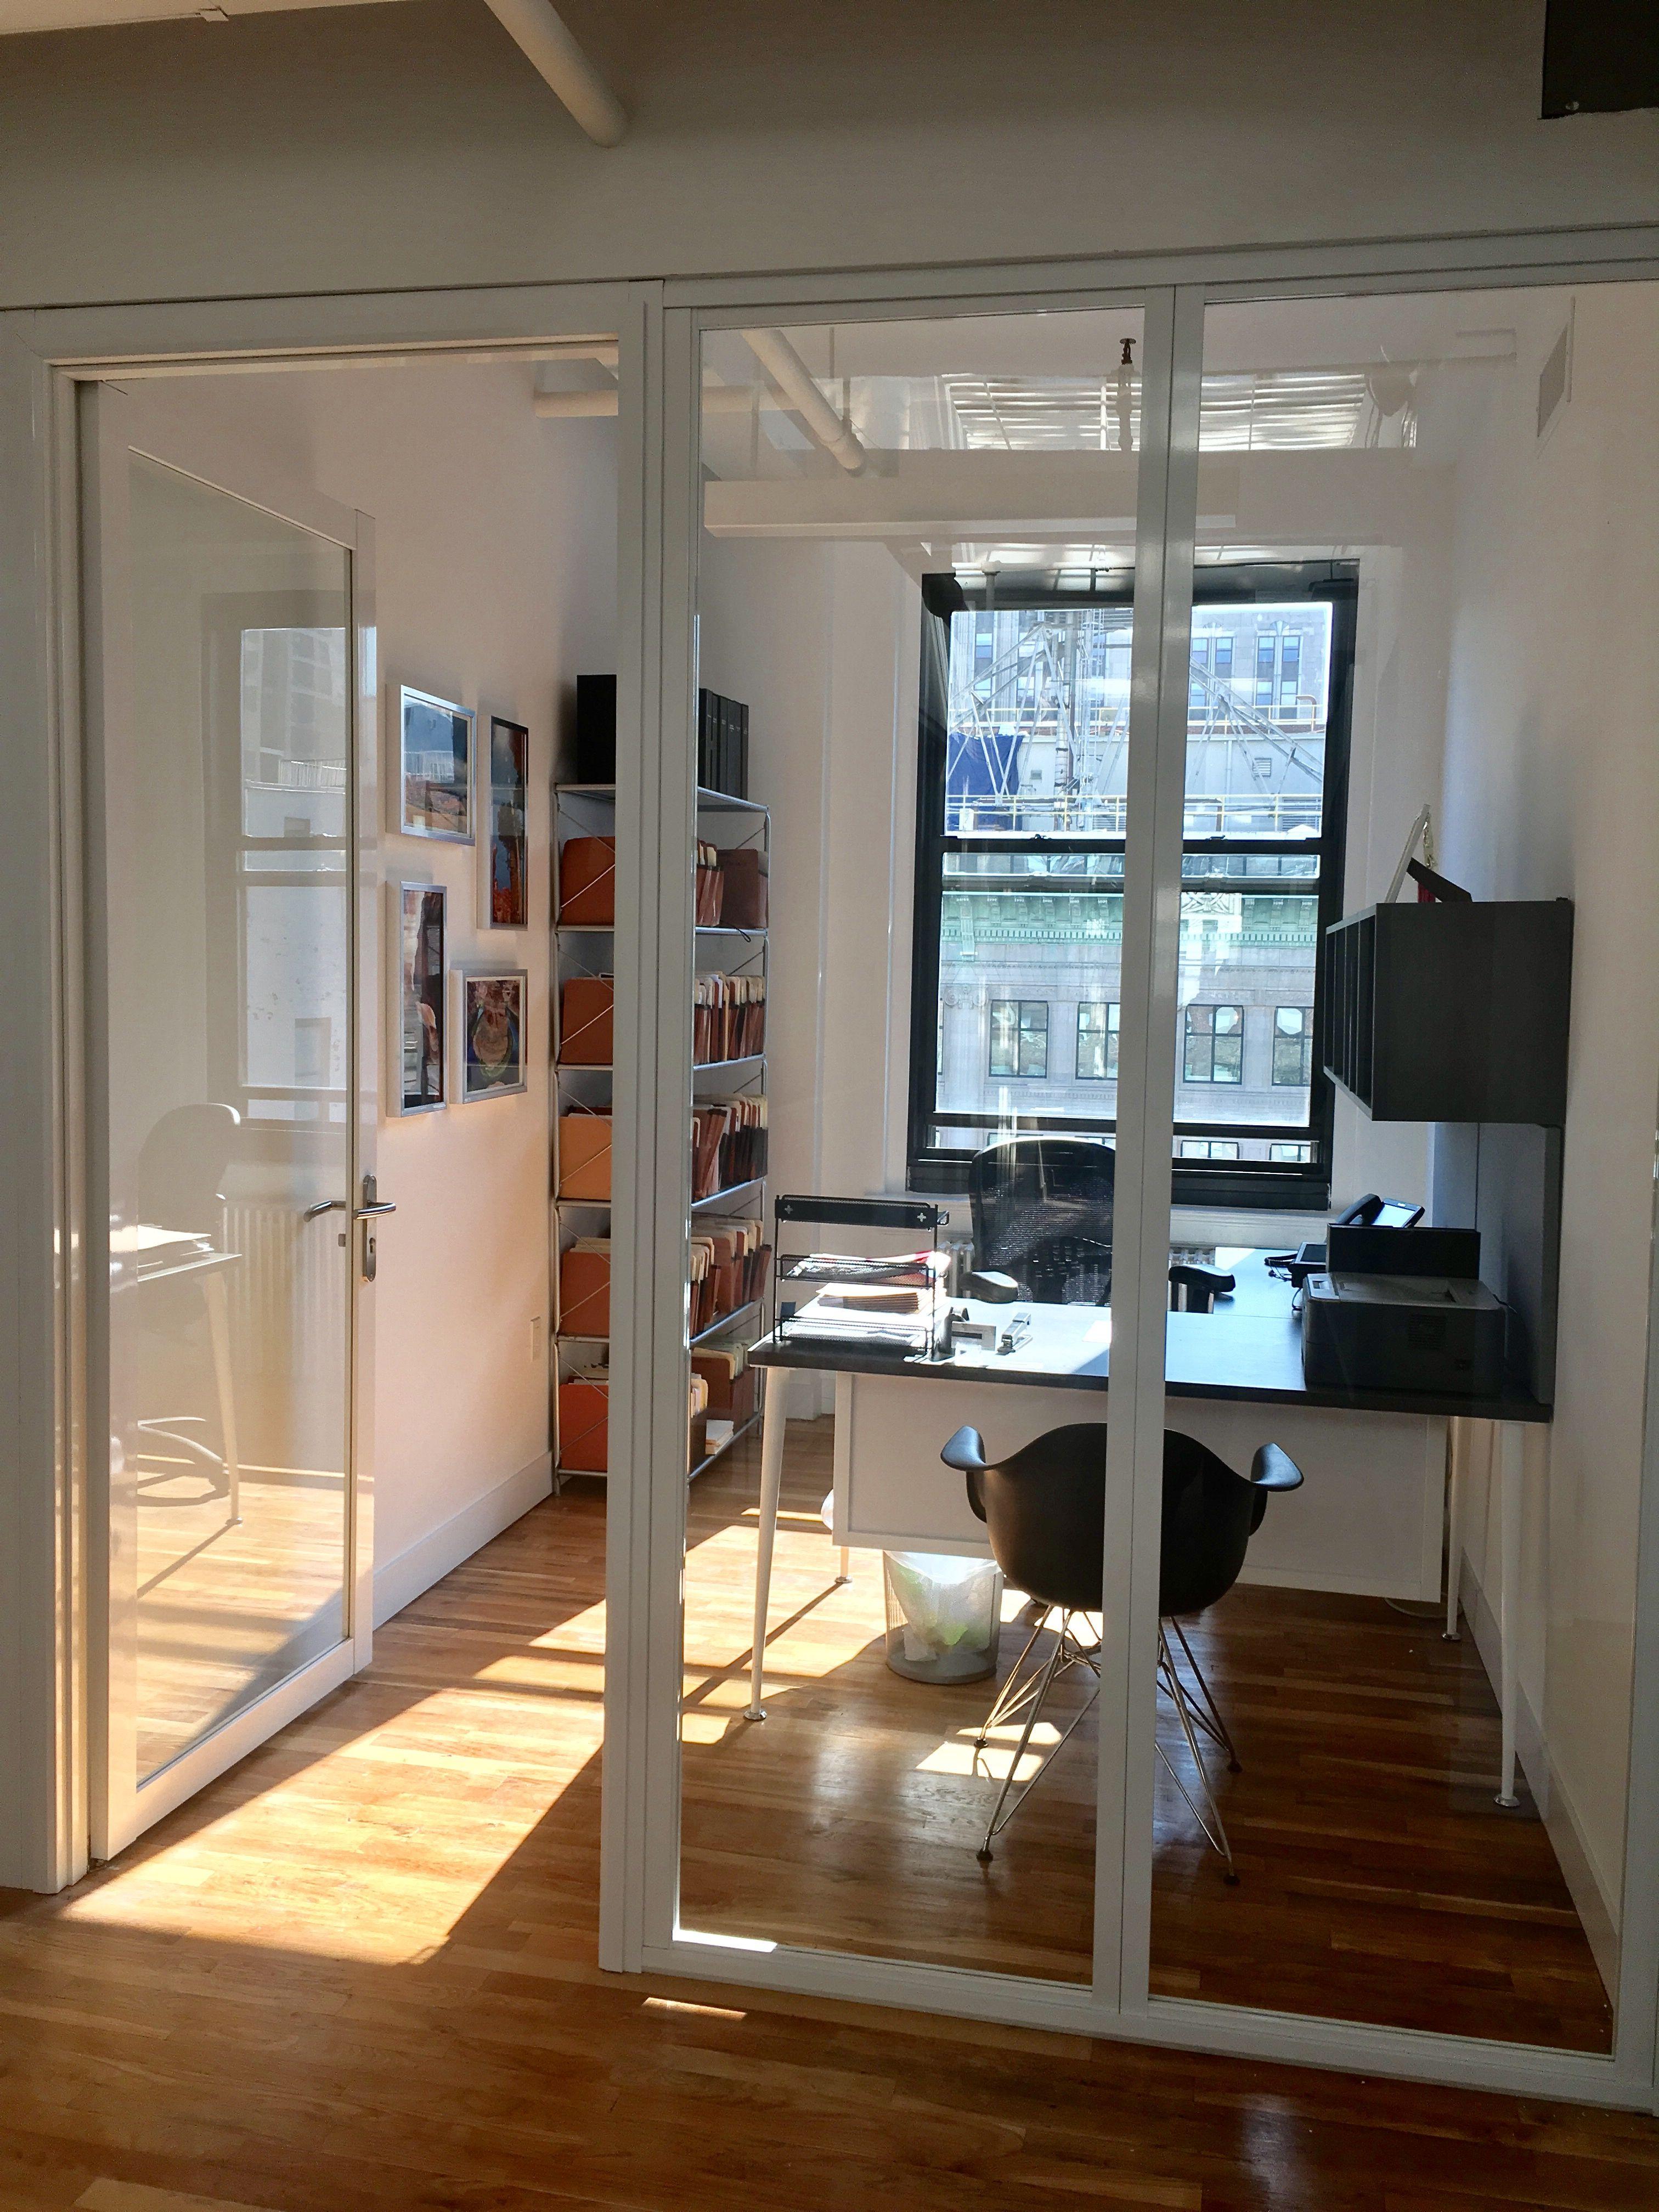 Study Room Glass: Sliding Doors Interior, Glass